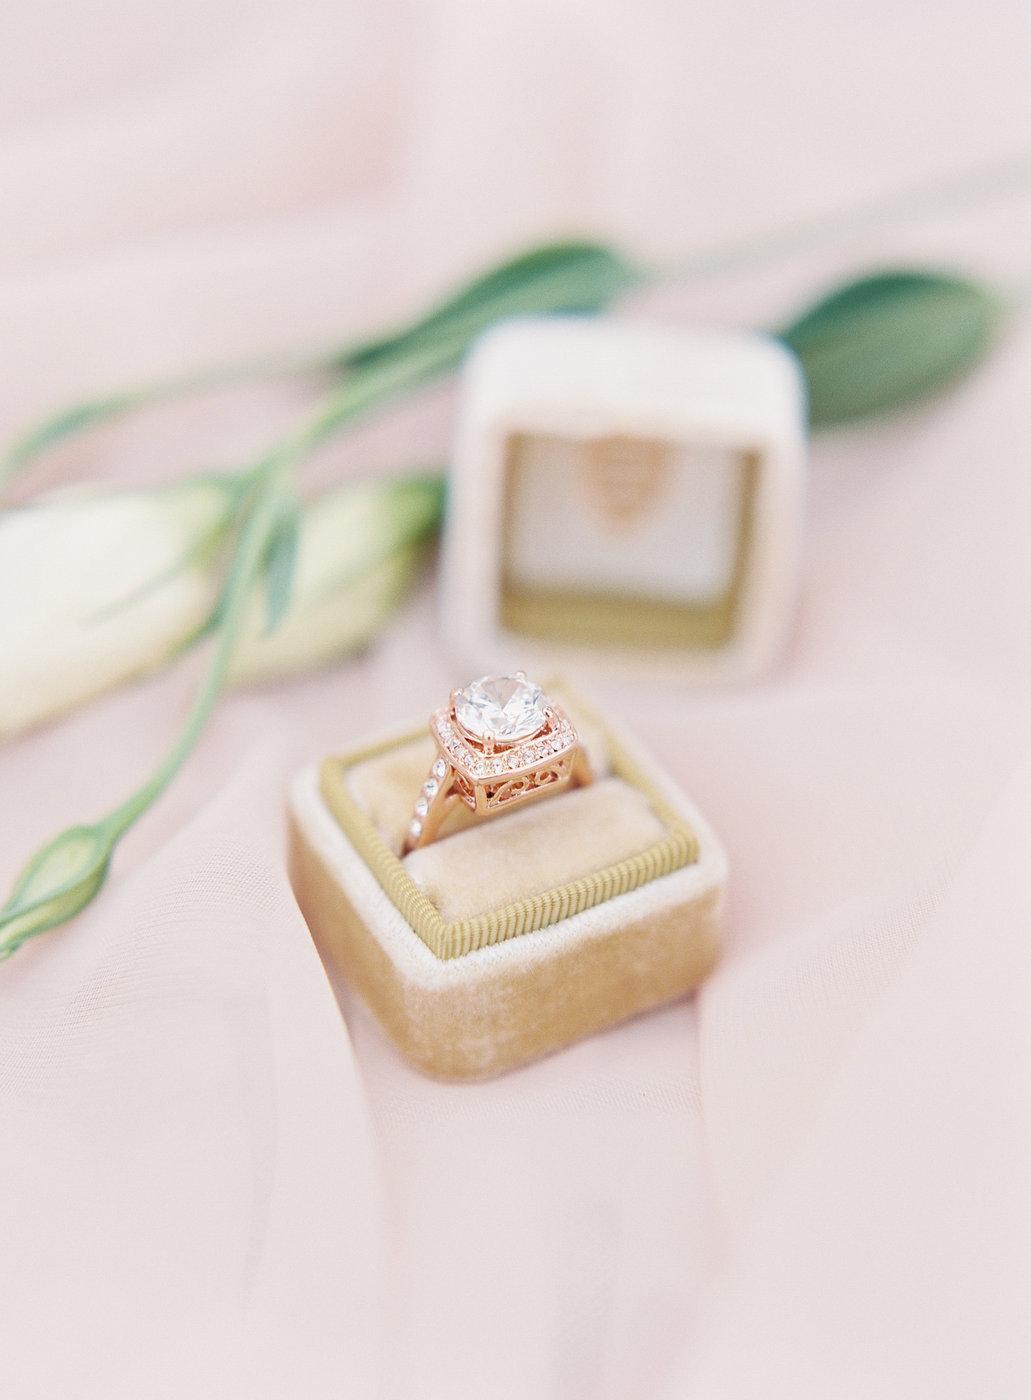 rose gold wedding ideas wedding band